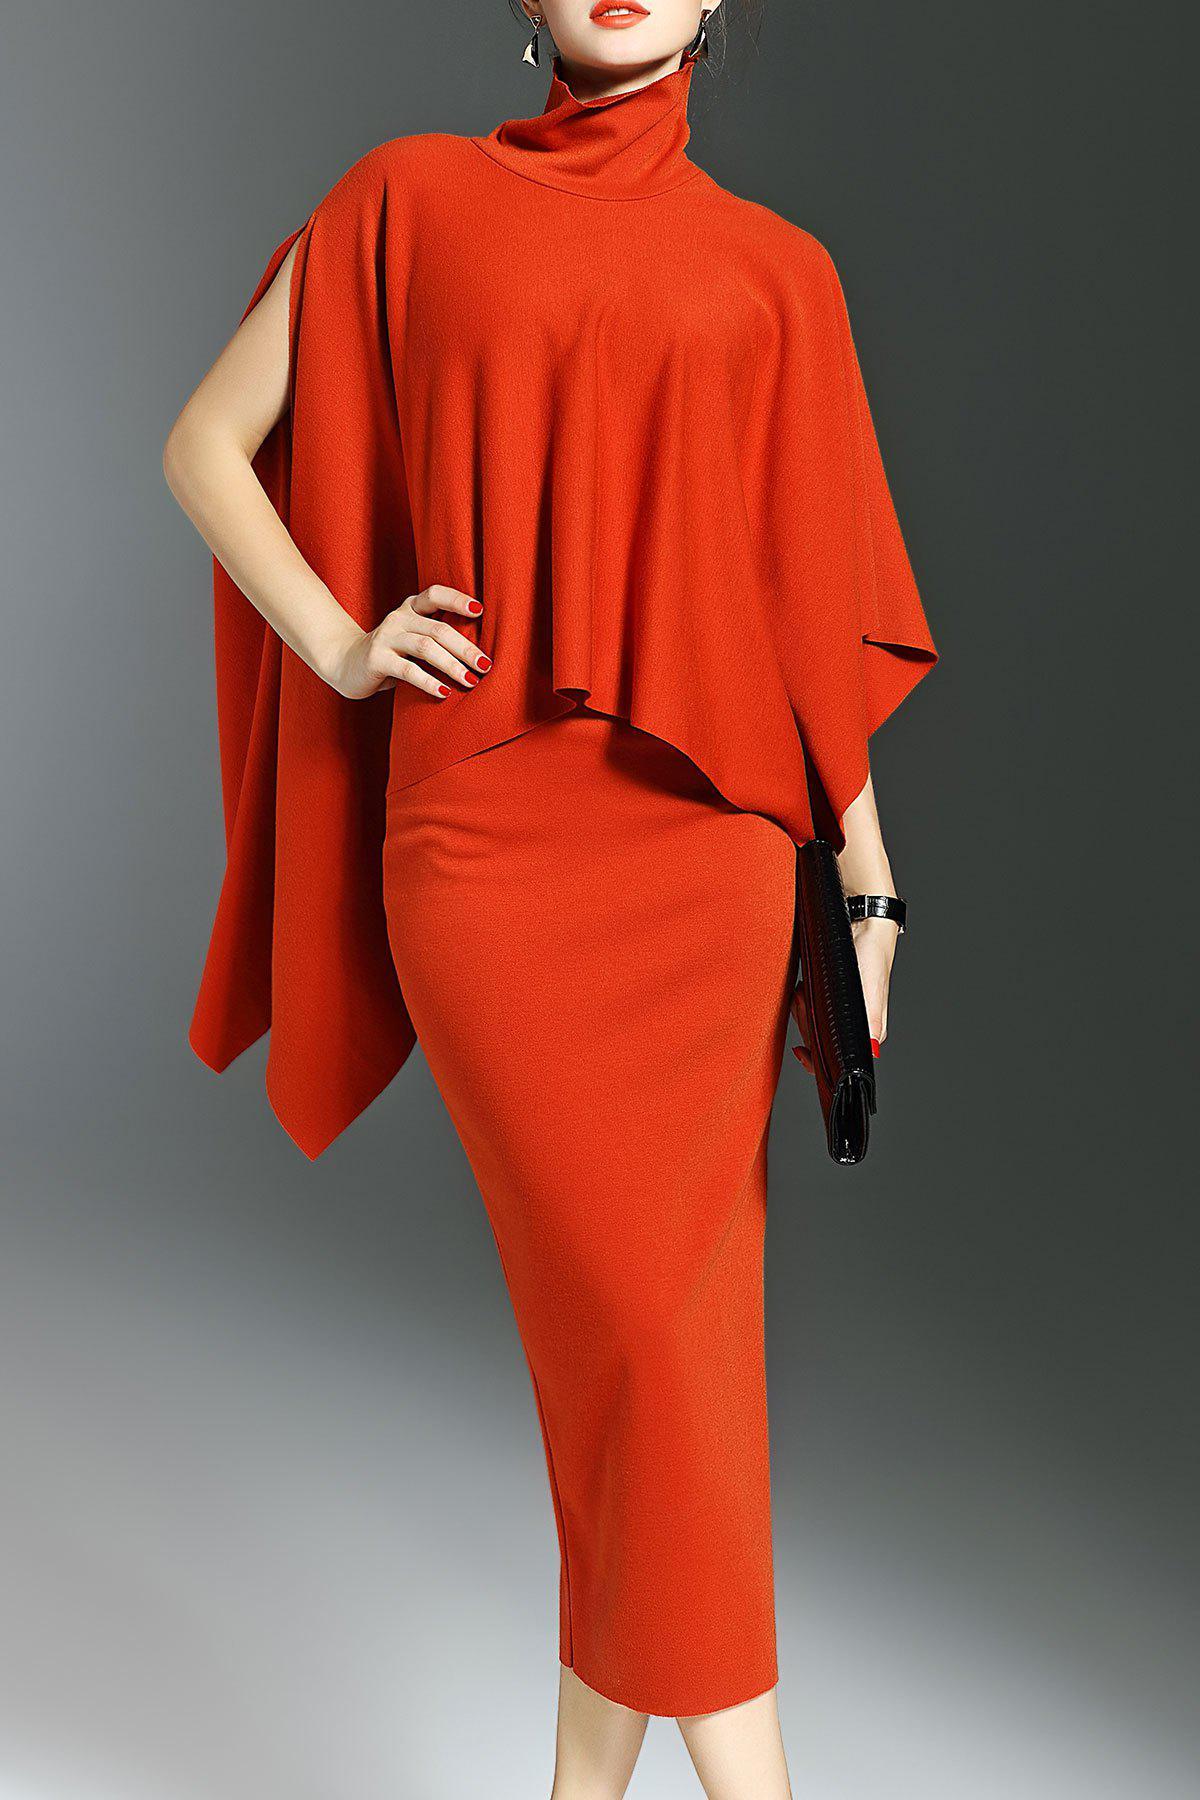 Asymmetrical Batwing Knitwear and Bodycon Skirt 198705001